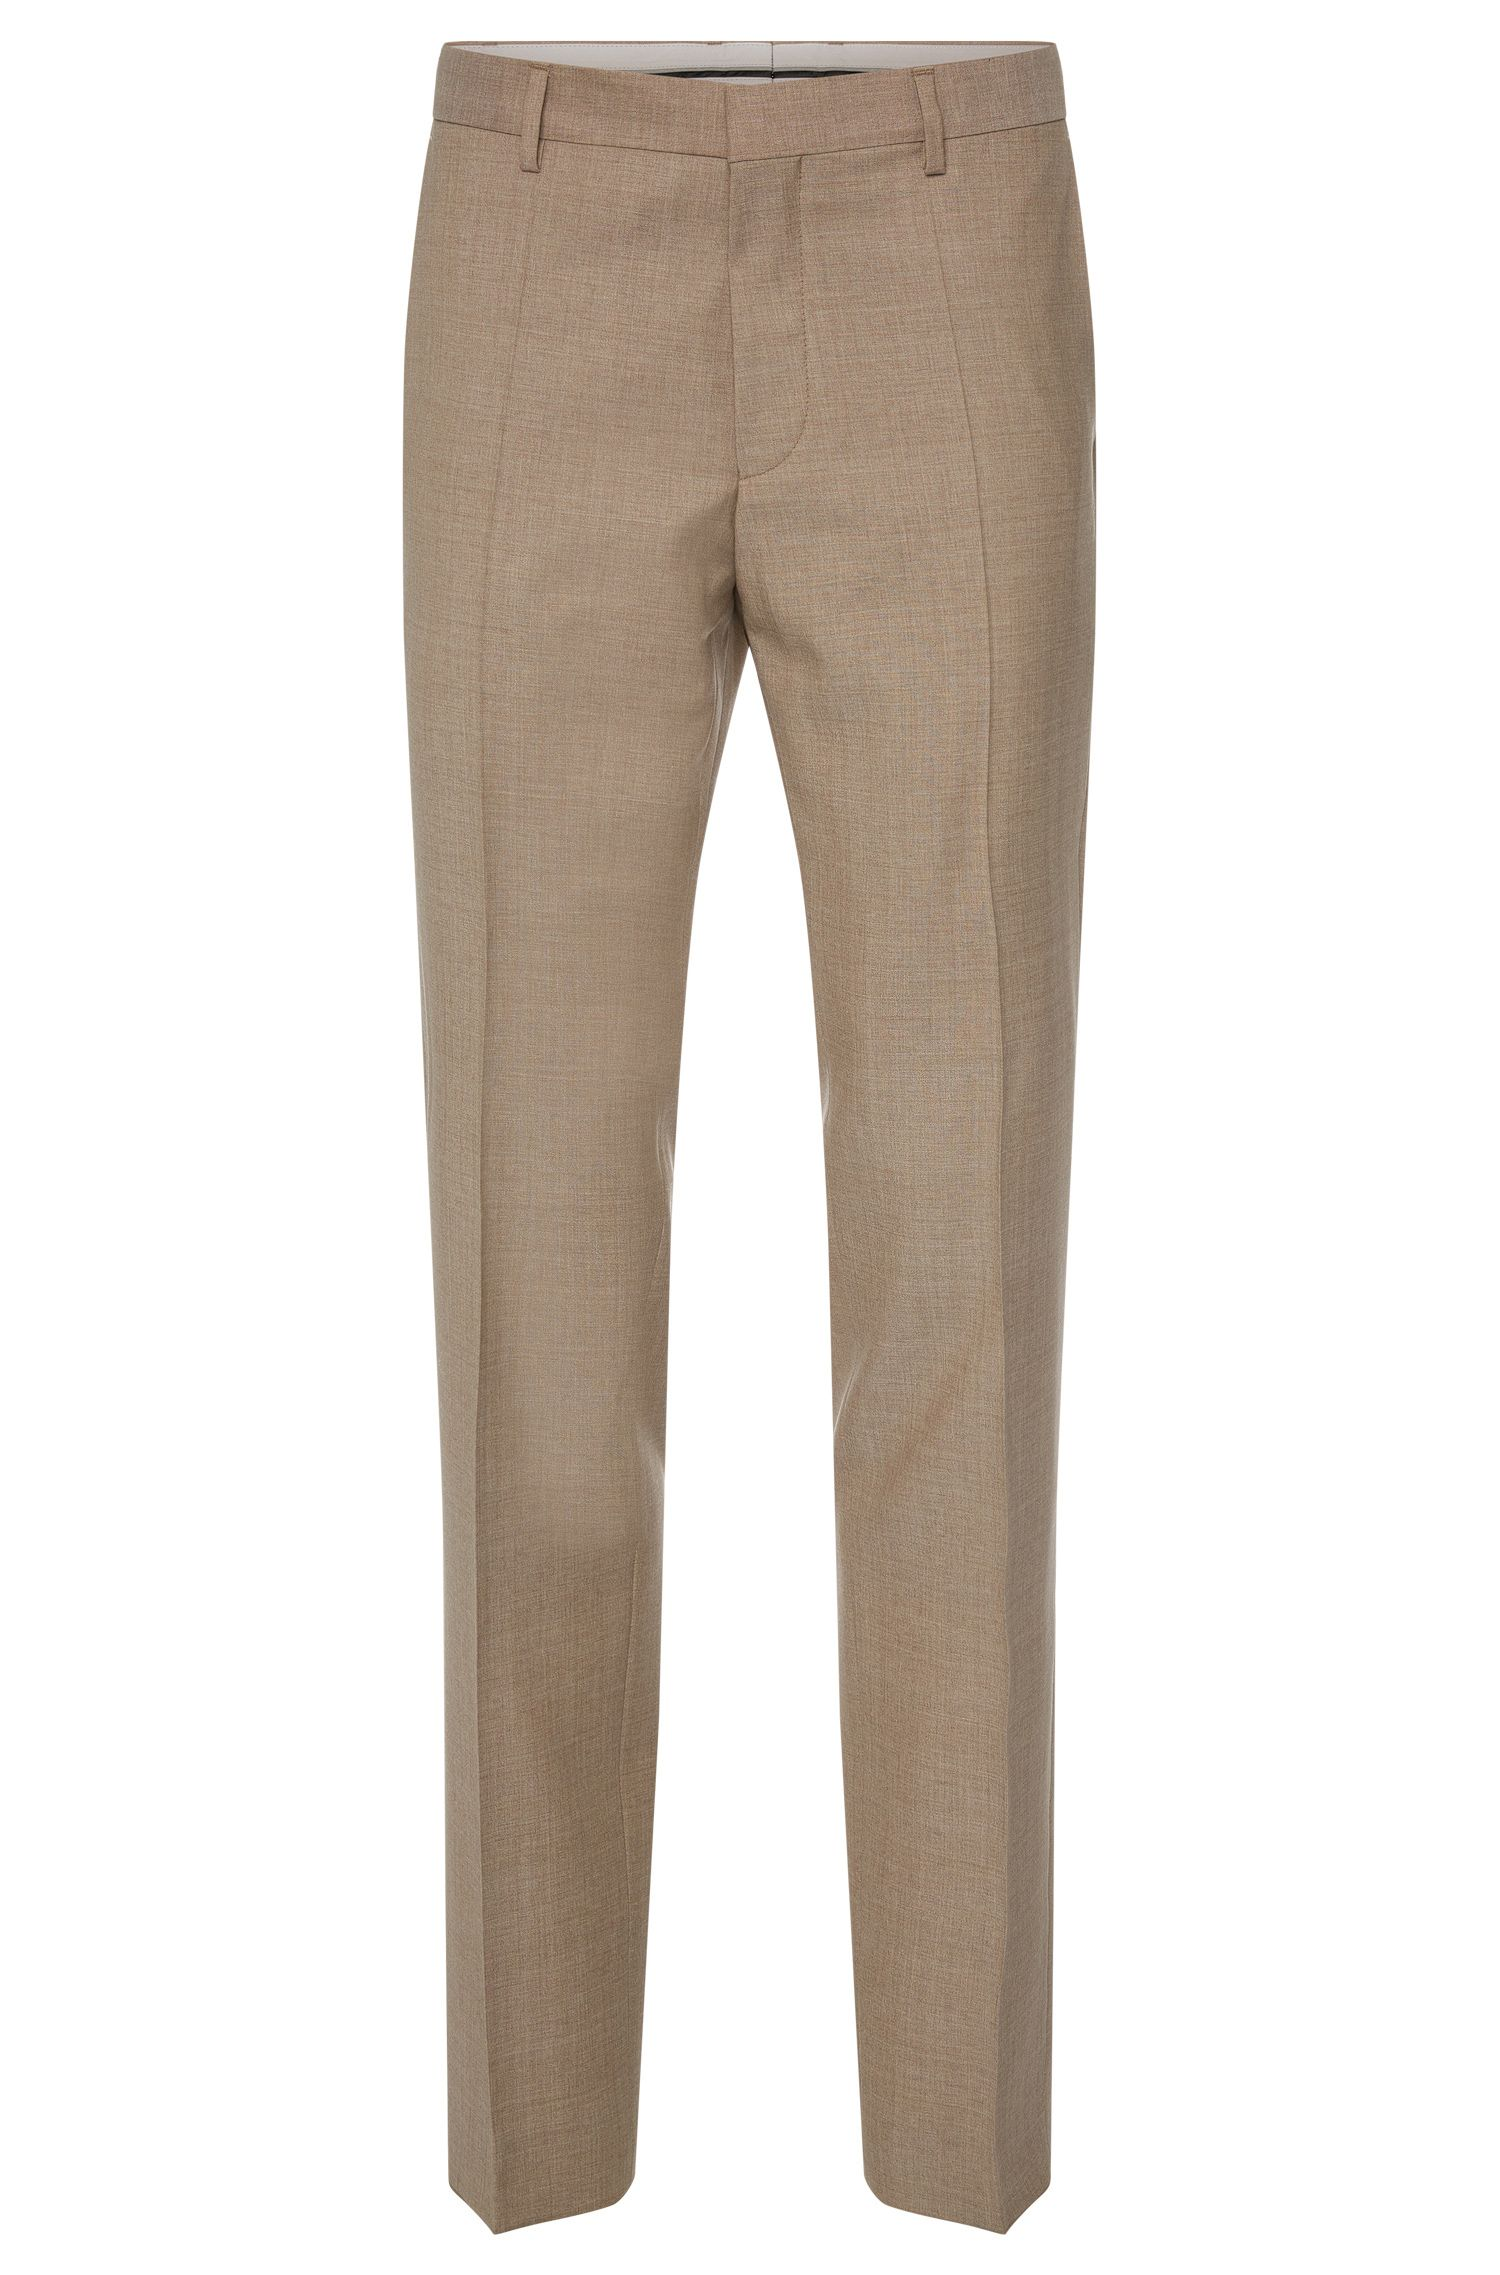 'Genesis' | Slim Fit, Italian Super 110 Virgin Wool Dress Pants